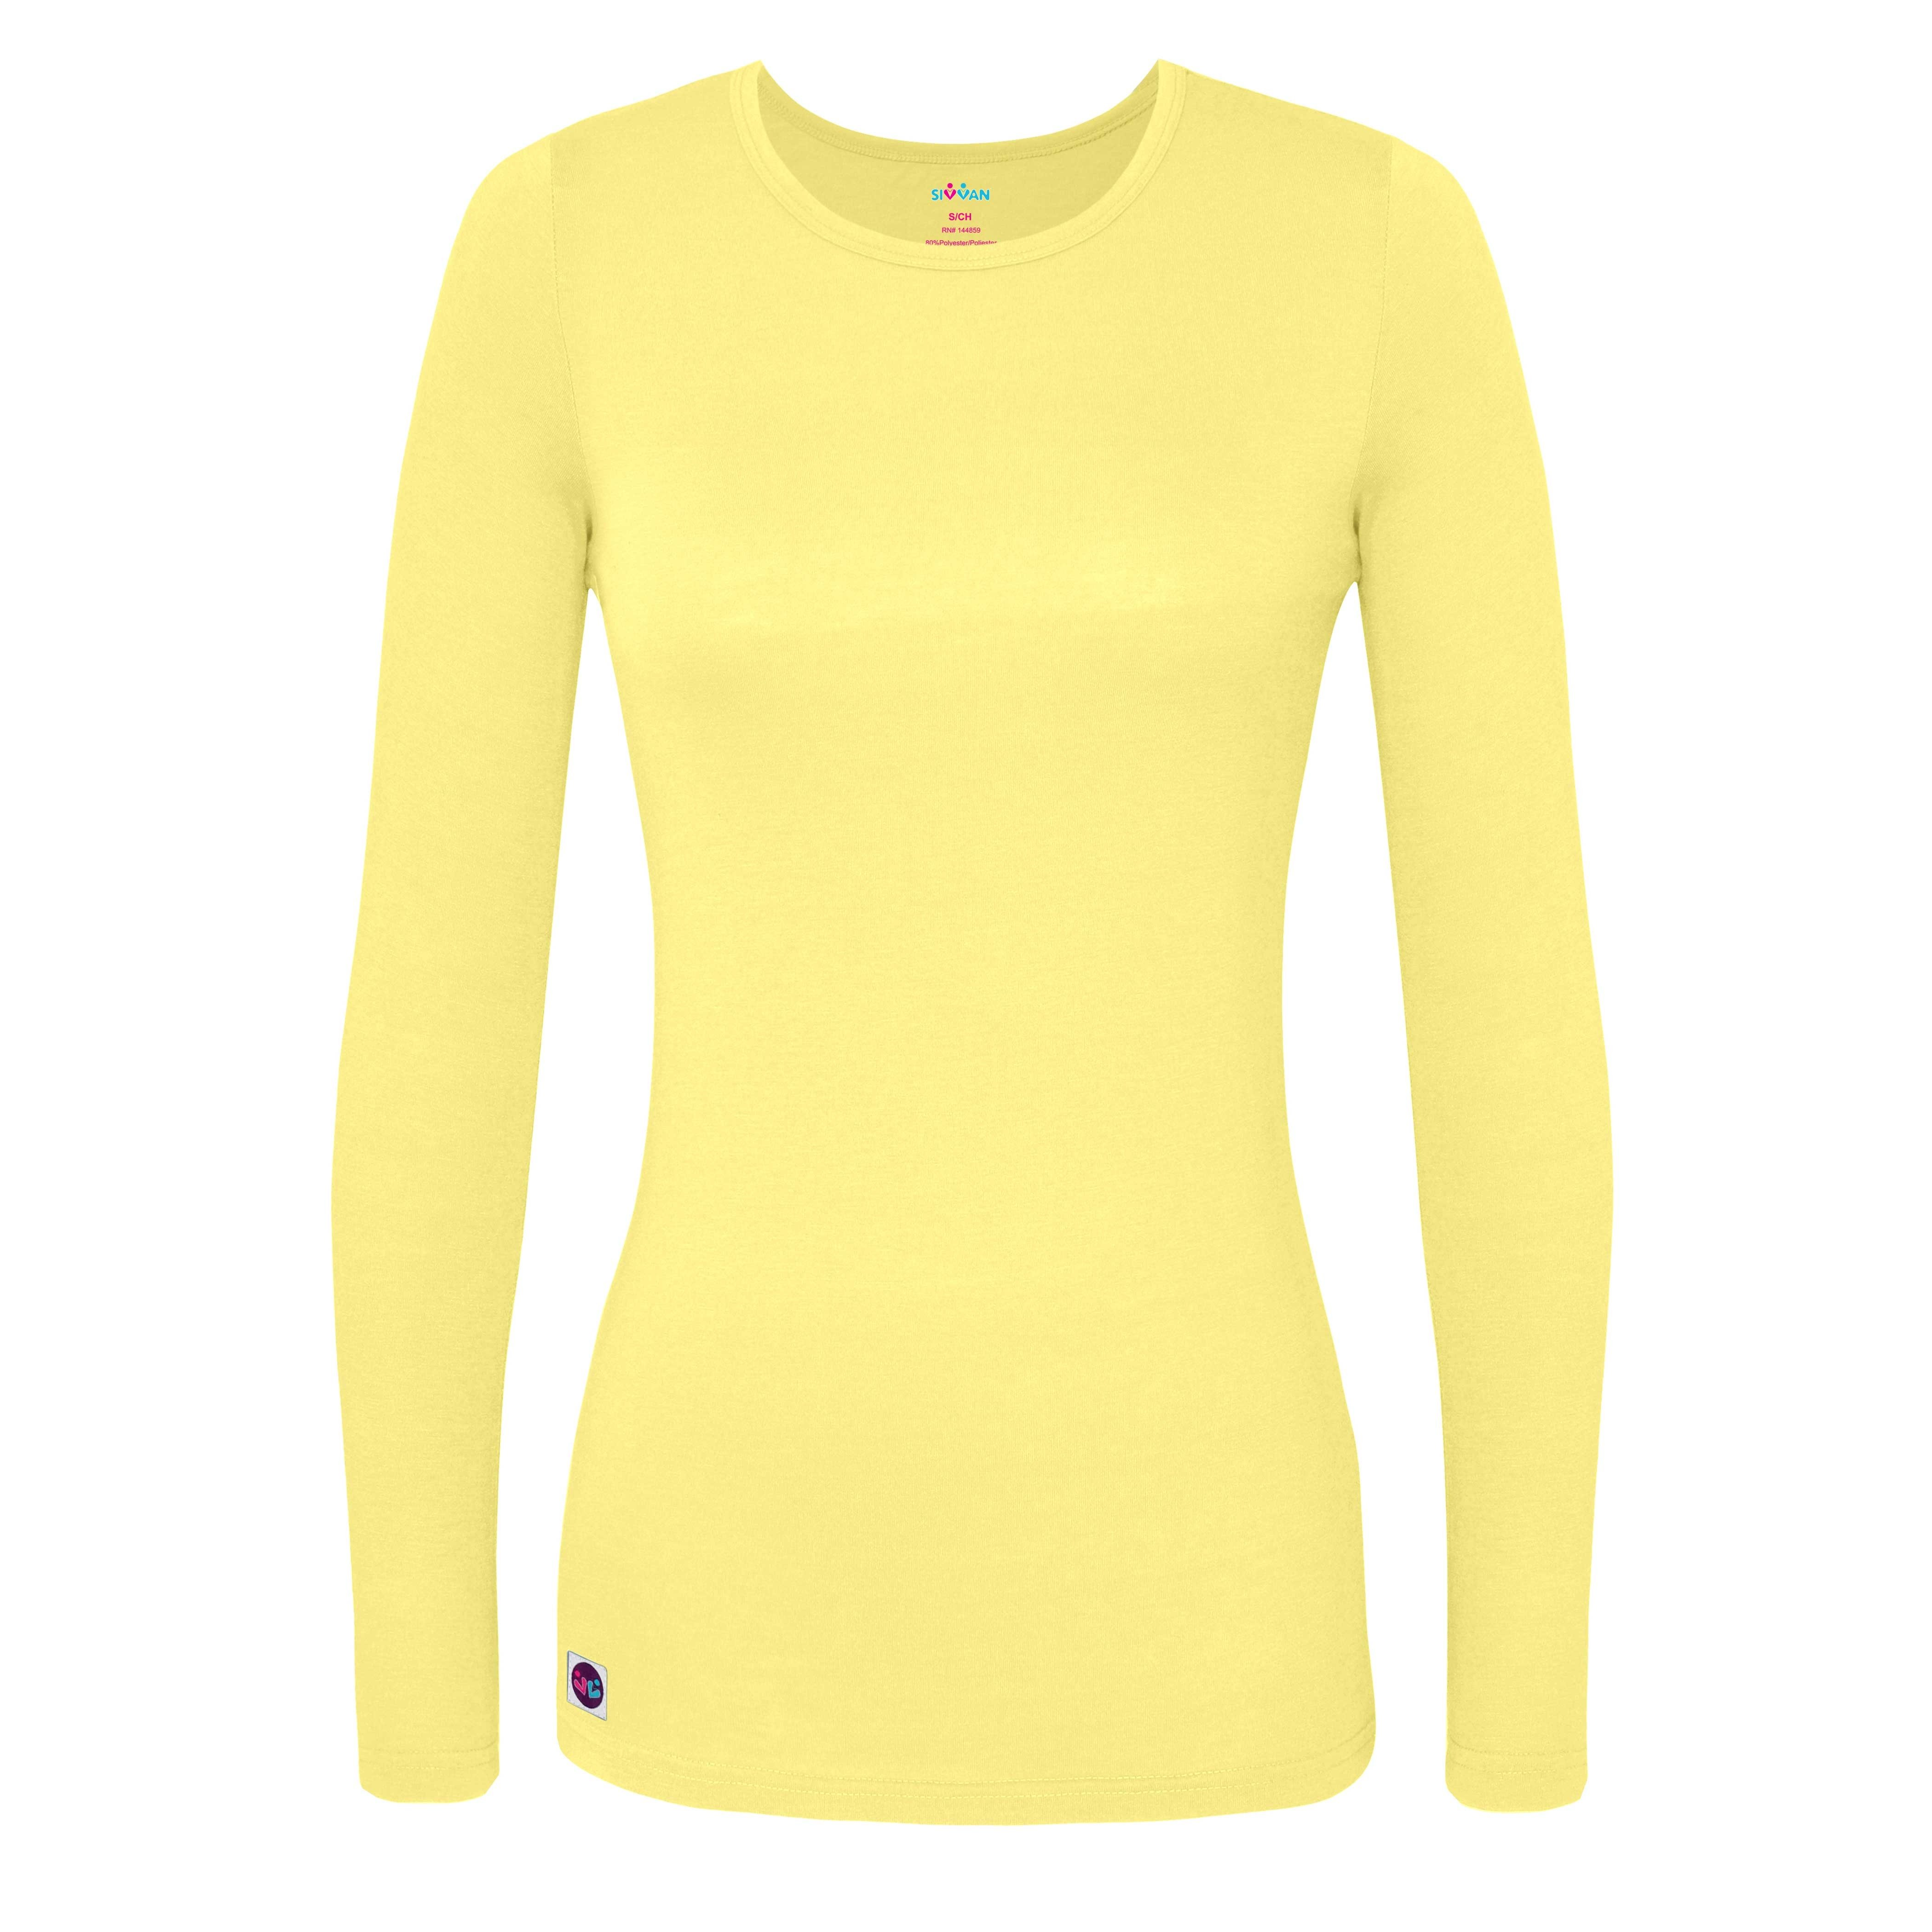 Sivvan Women's Comfort Long Sleeve T-Shirt, Underscrub Tee, Yoga ...